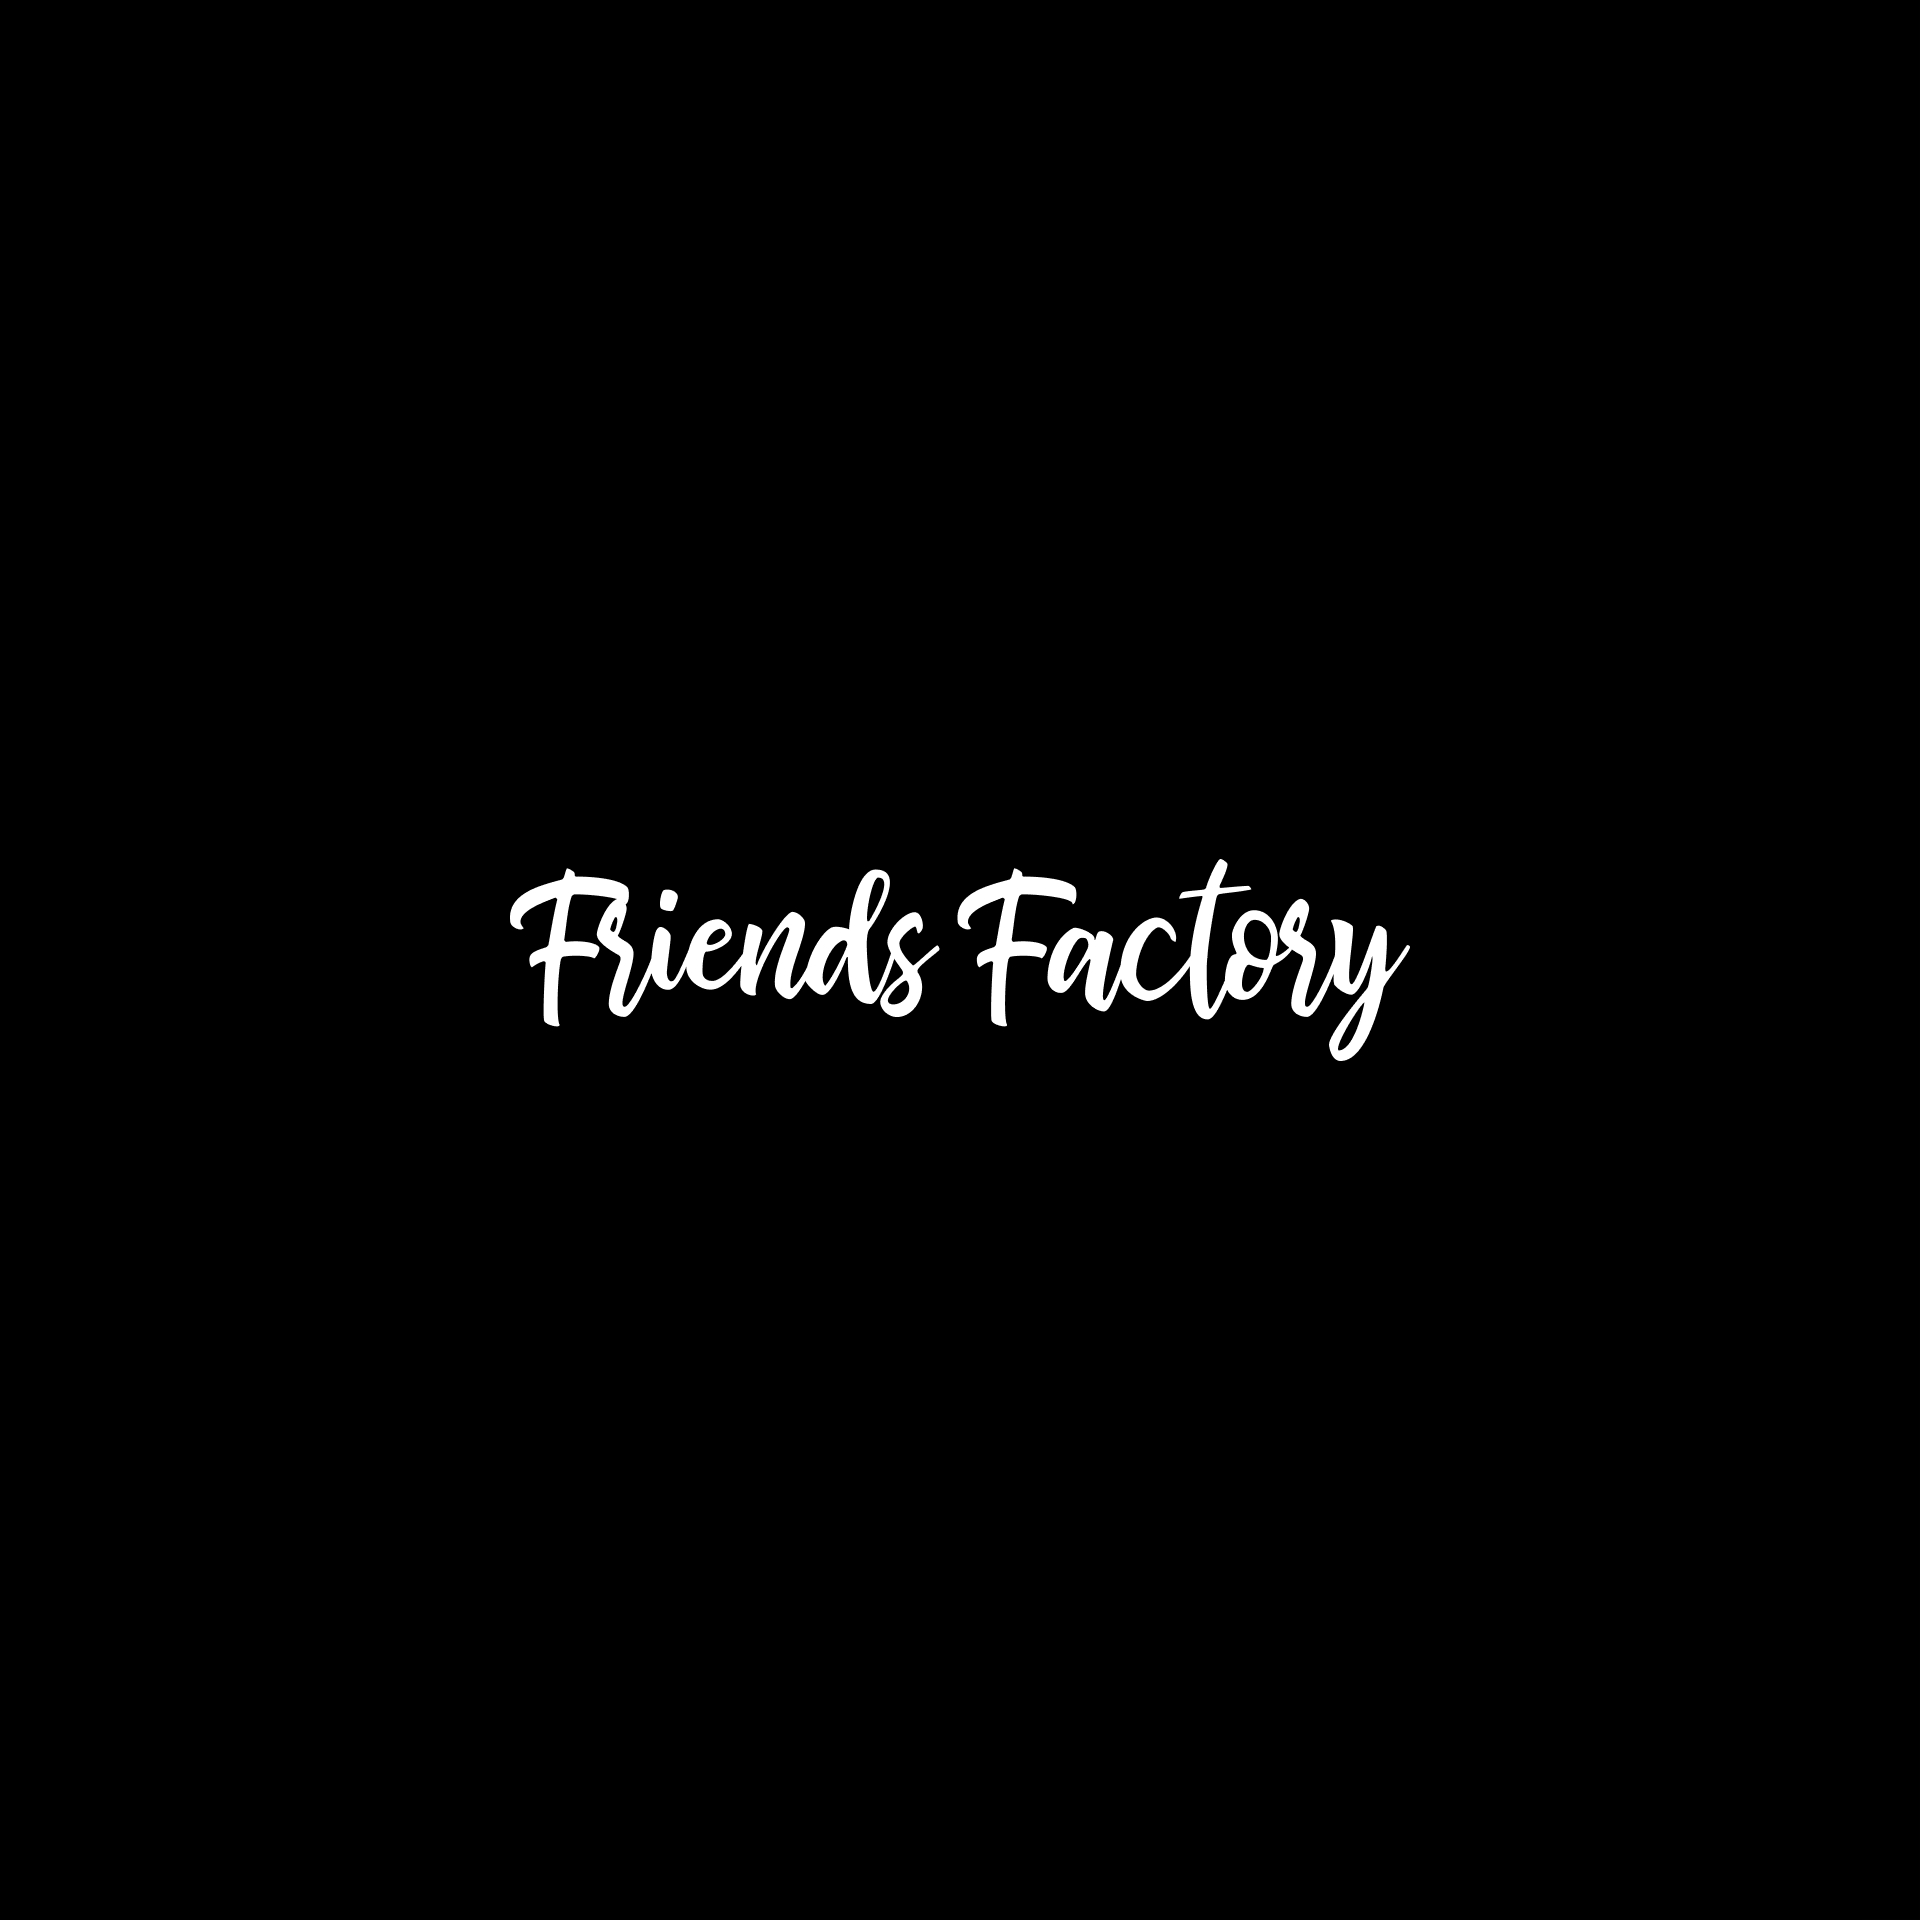 Friends factory